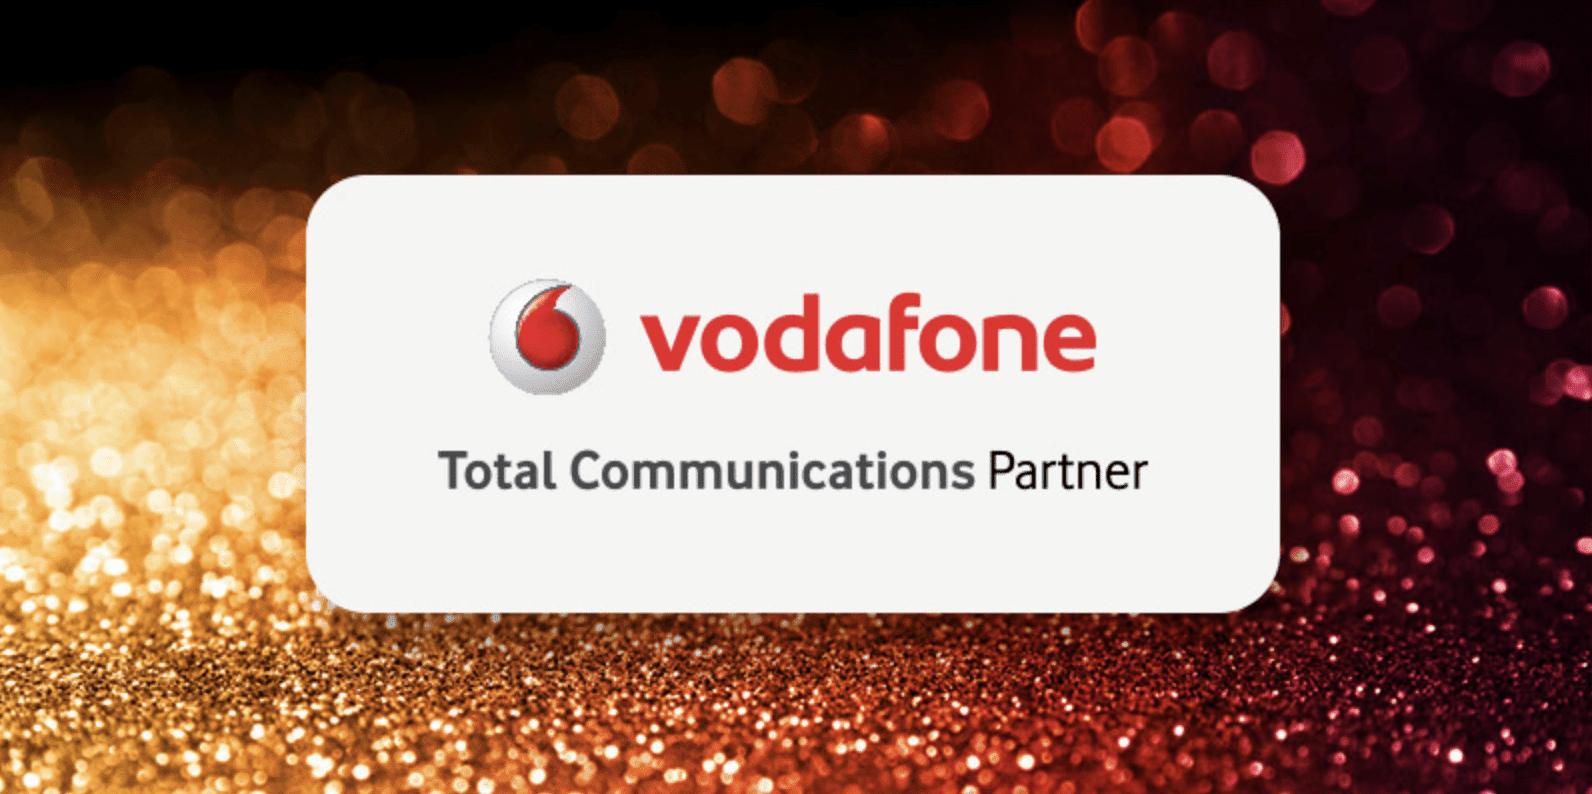 Redsquid-vodafone-total-communications-partner